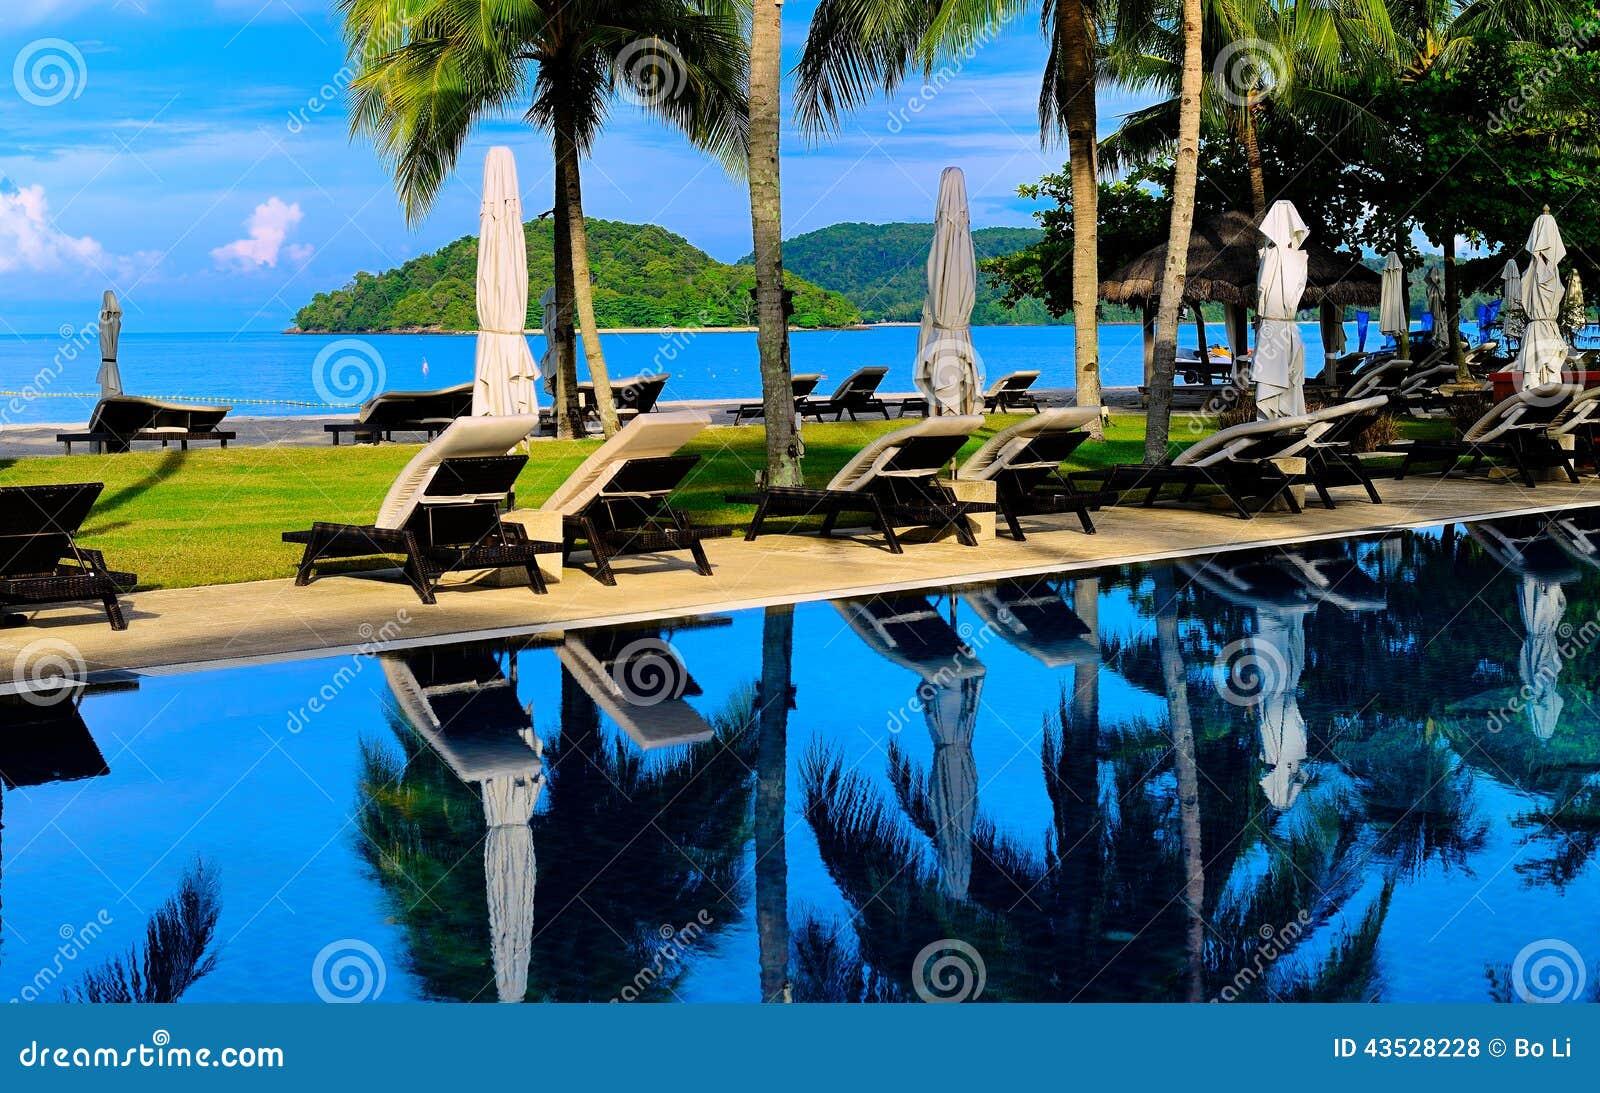 Swimming Pool Stock Photo Image 43528228